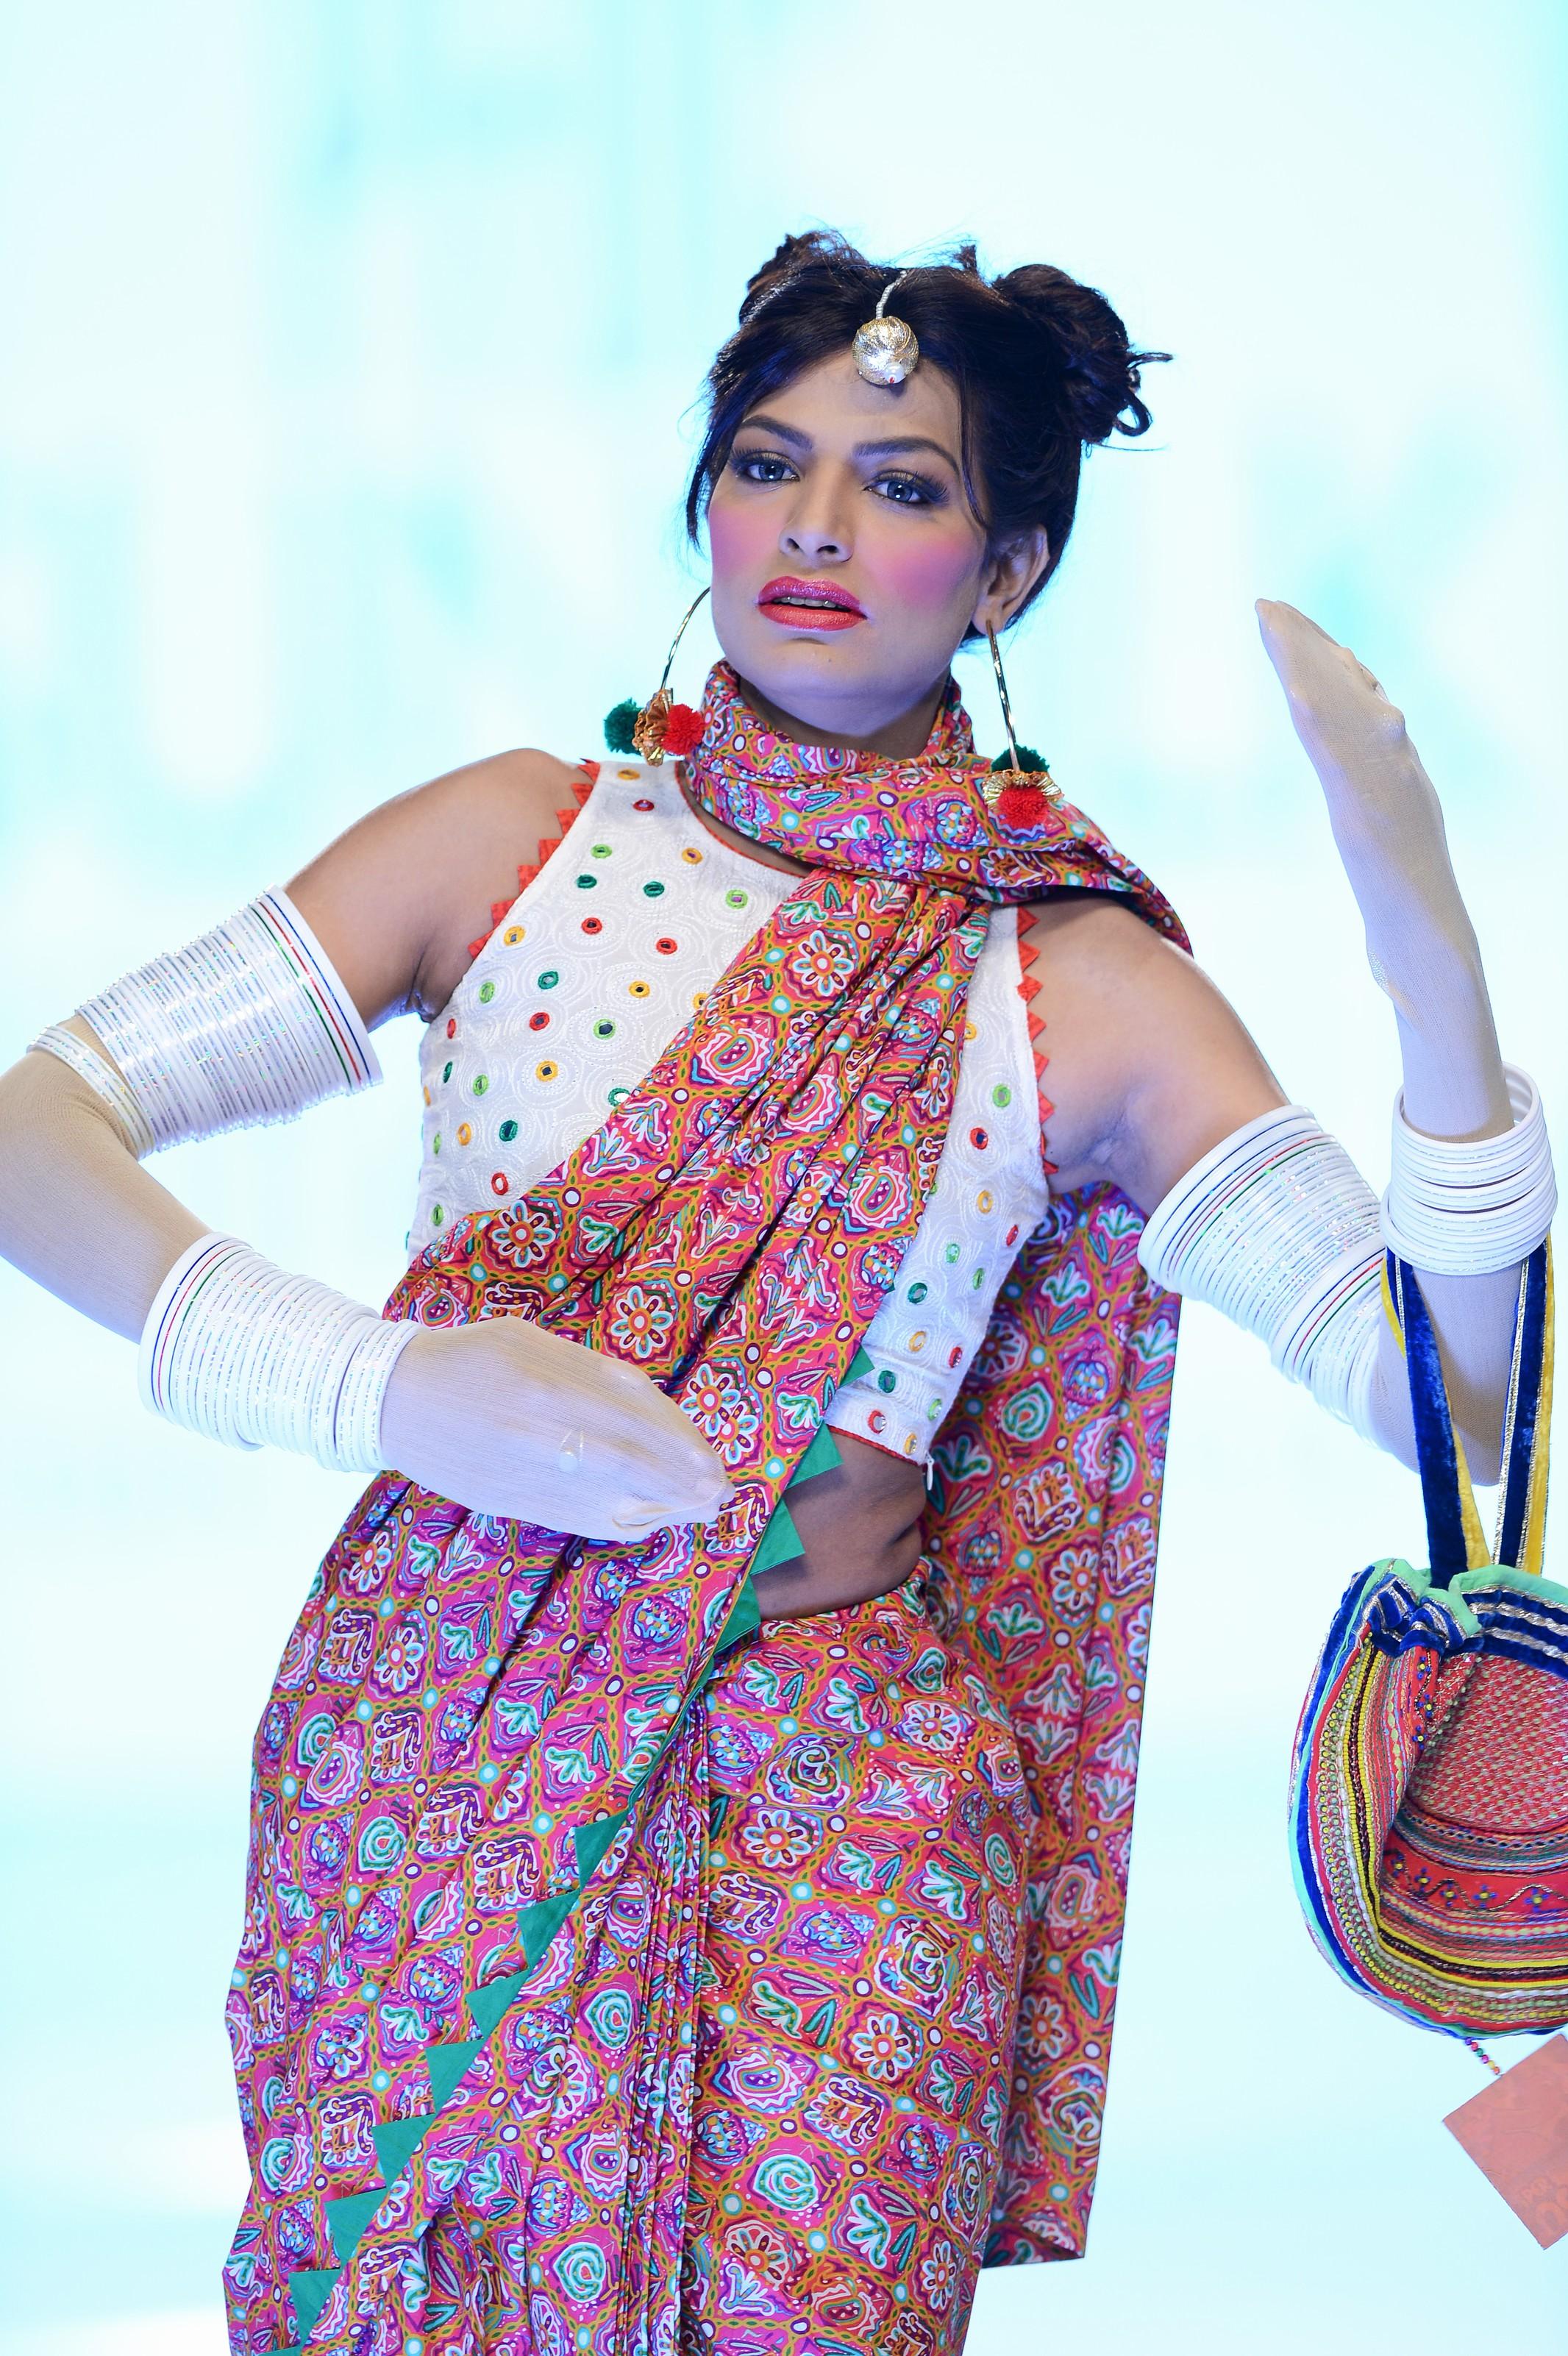 Kayseria Latest Winter Prints Best Shawls Dresses 2014: Kayseria « Musings Of A Fashion Designer